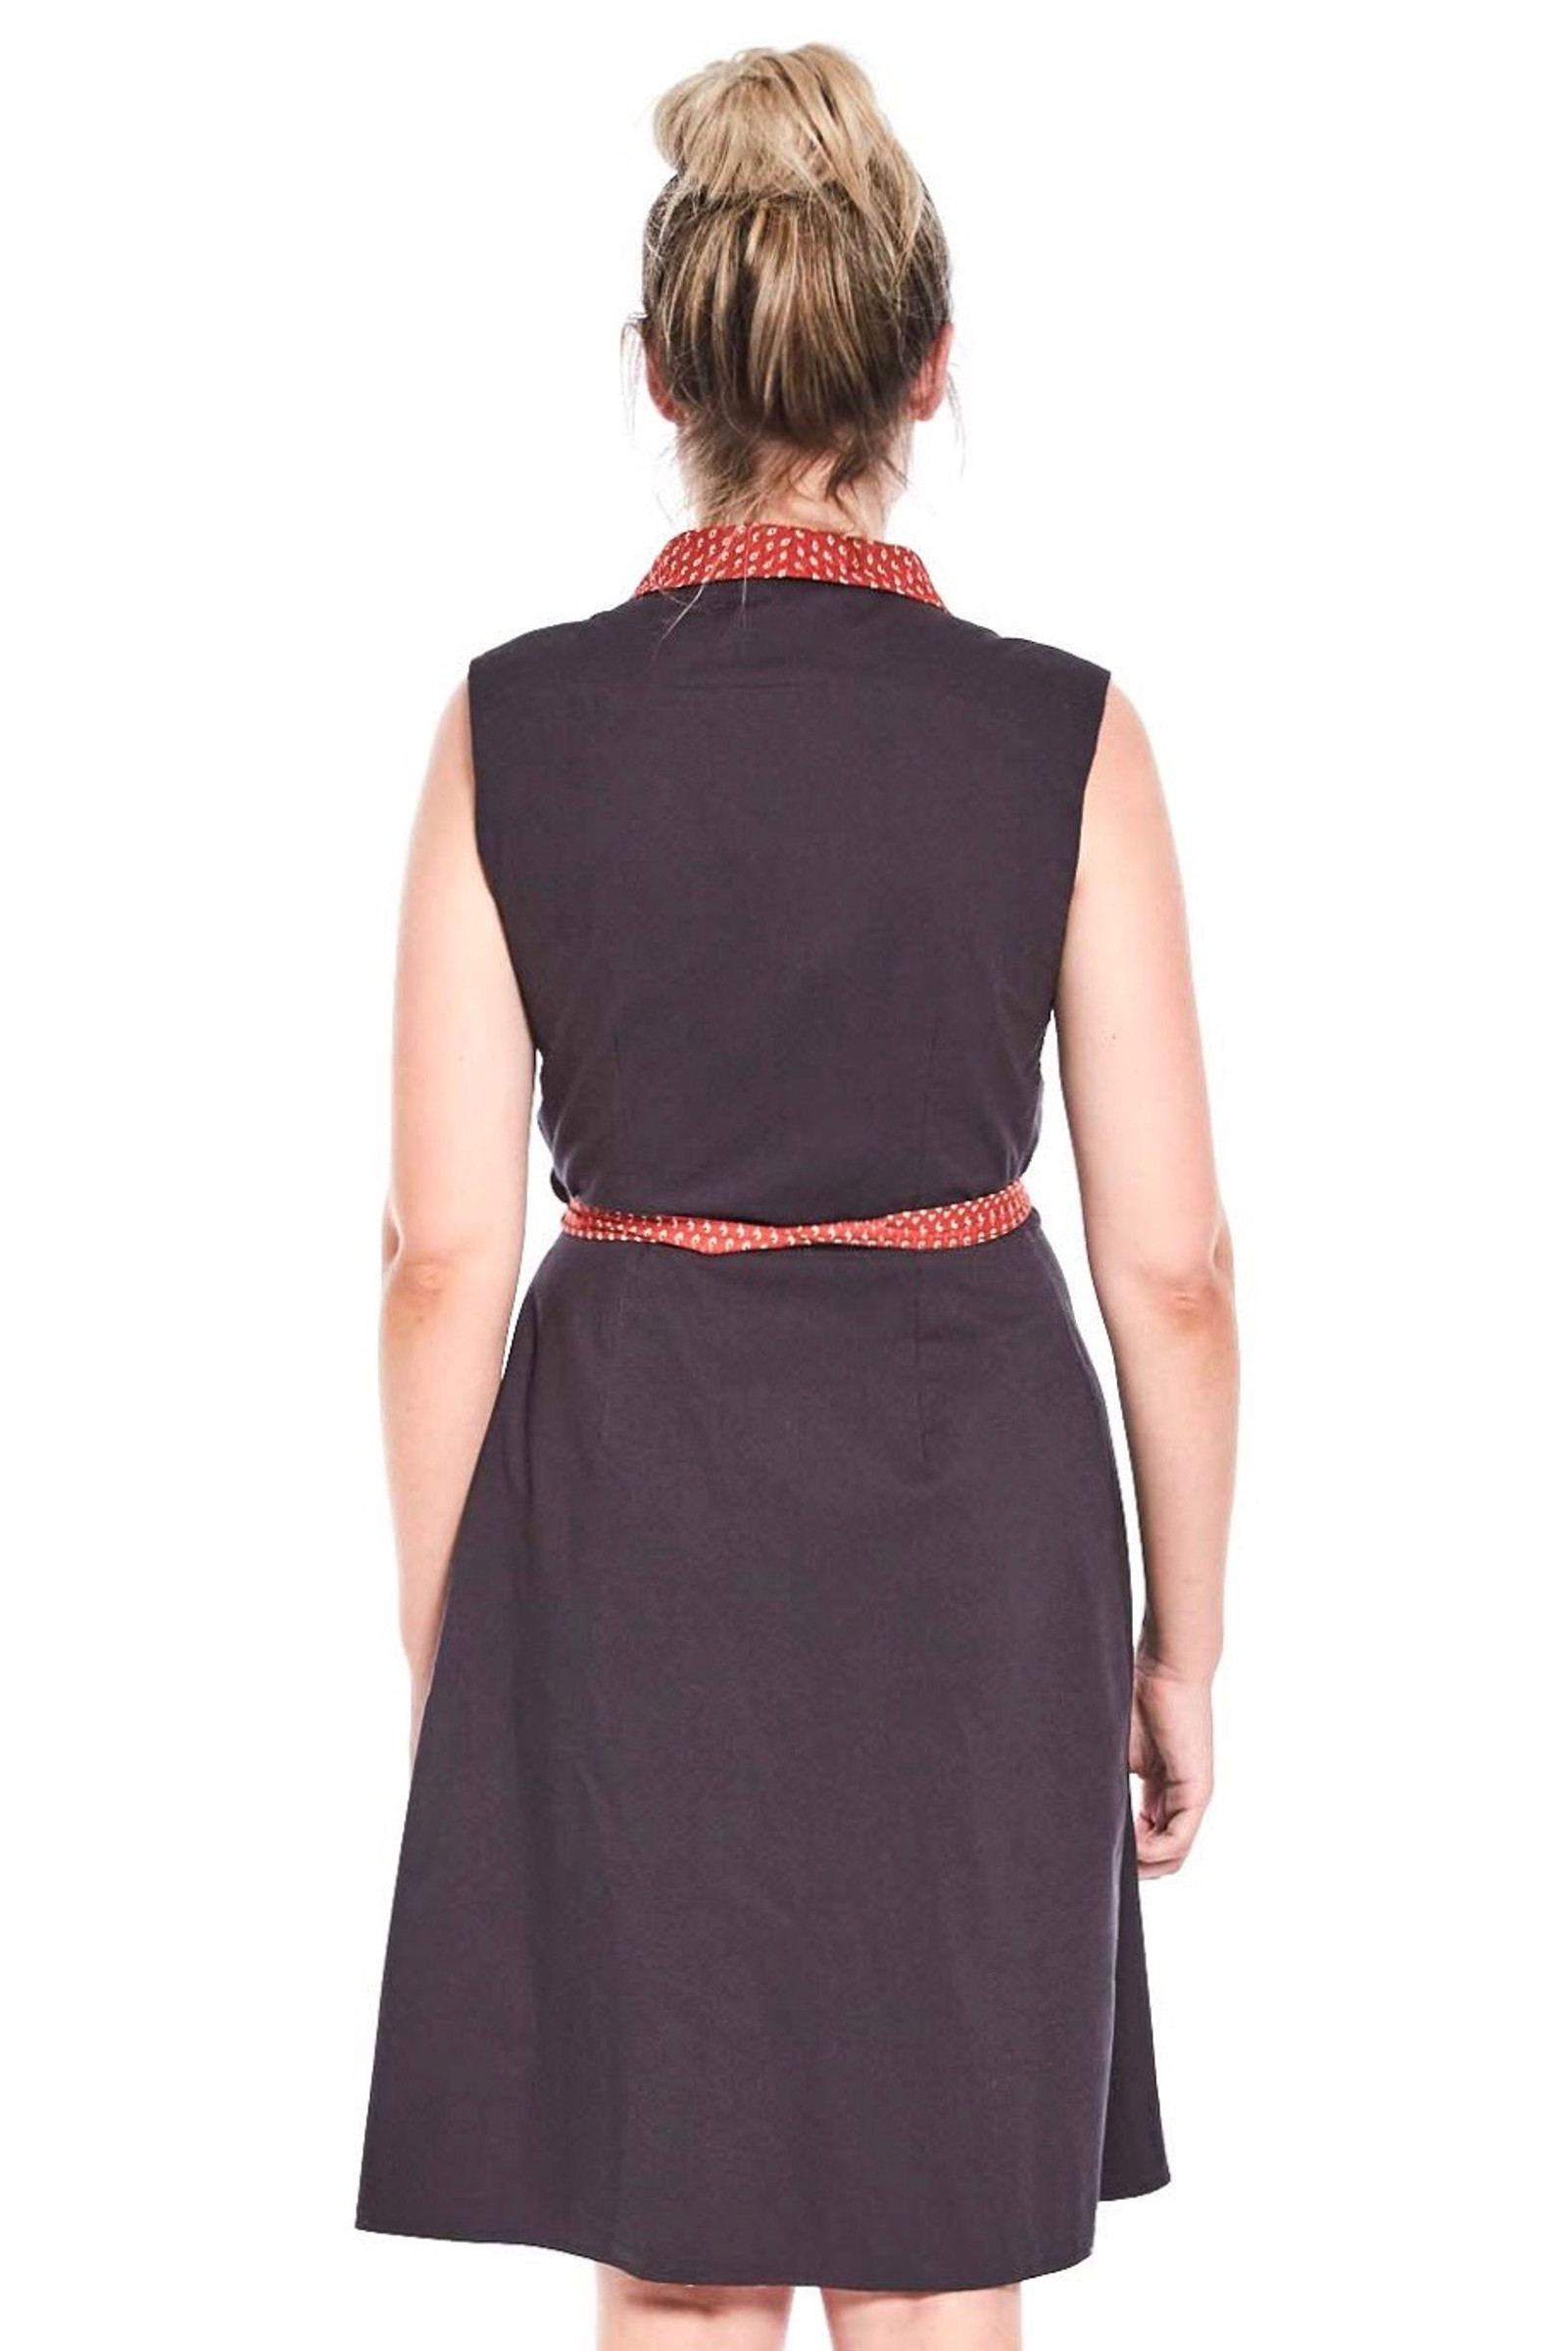 Reversible Rhianna Wrap Dress - Seed Red & Navy